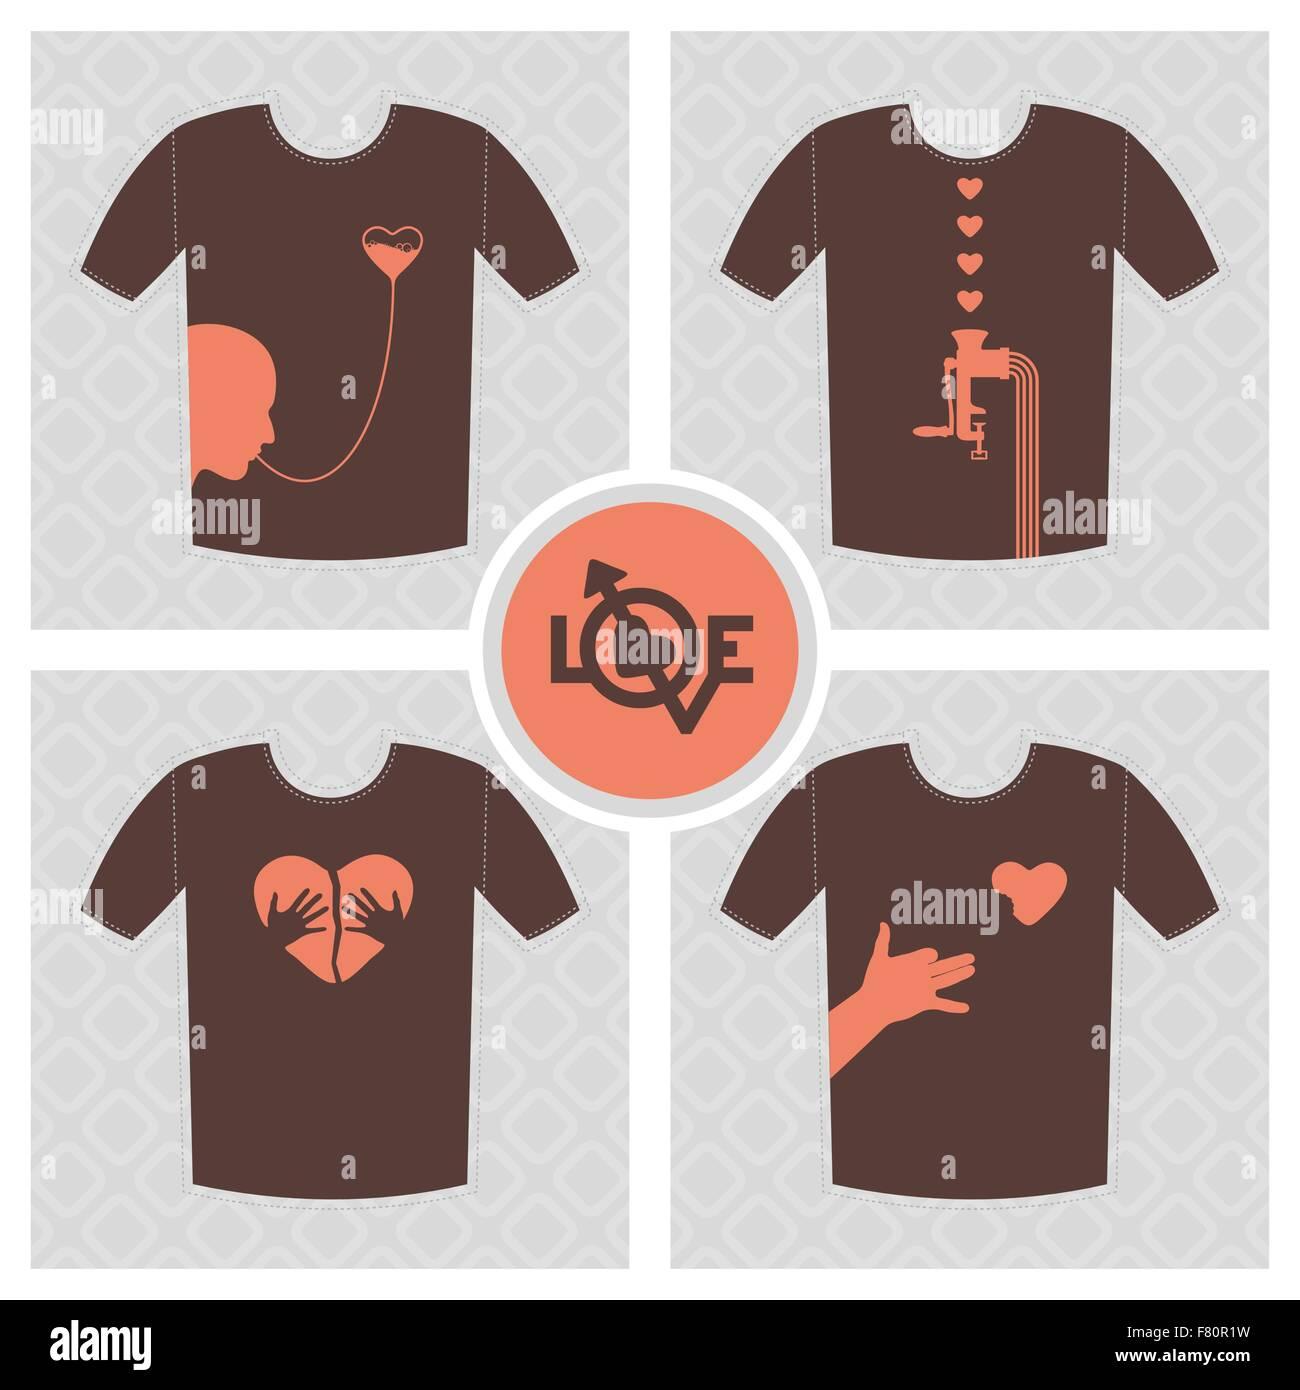 Conceptual set of t-shirt print vector; logo design elements, unrequited love concept with broken heart. - Stock Image